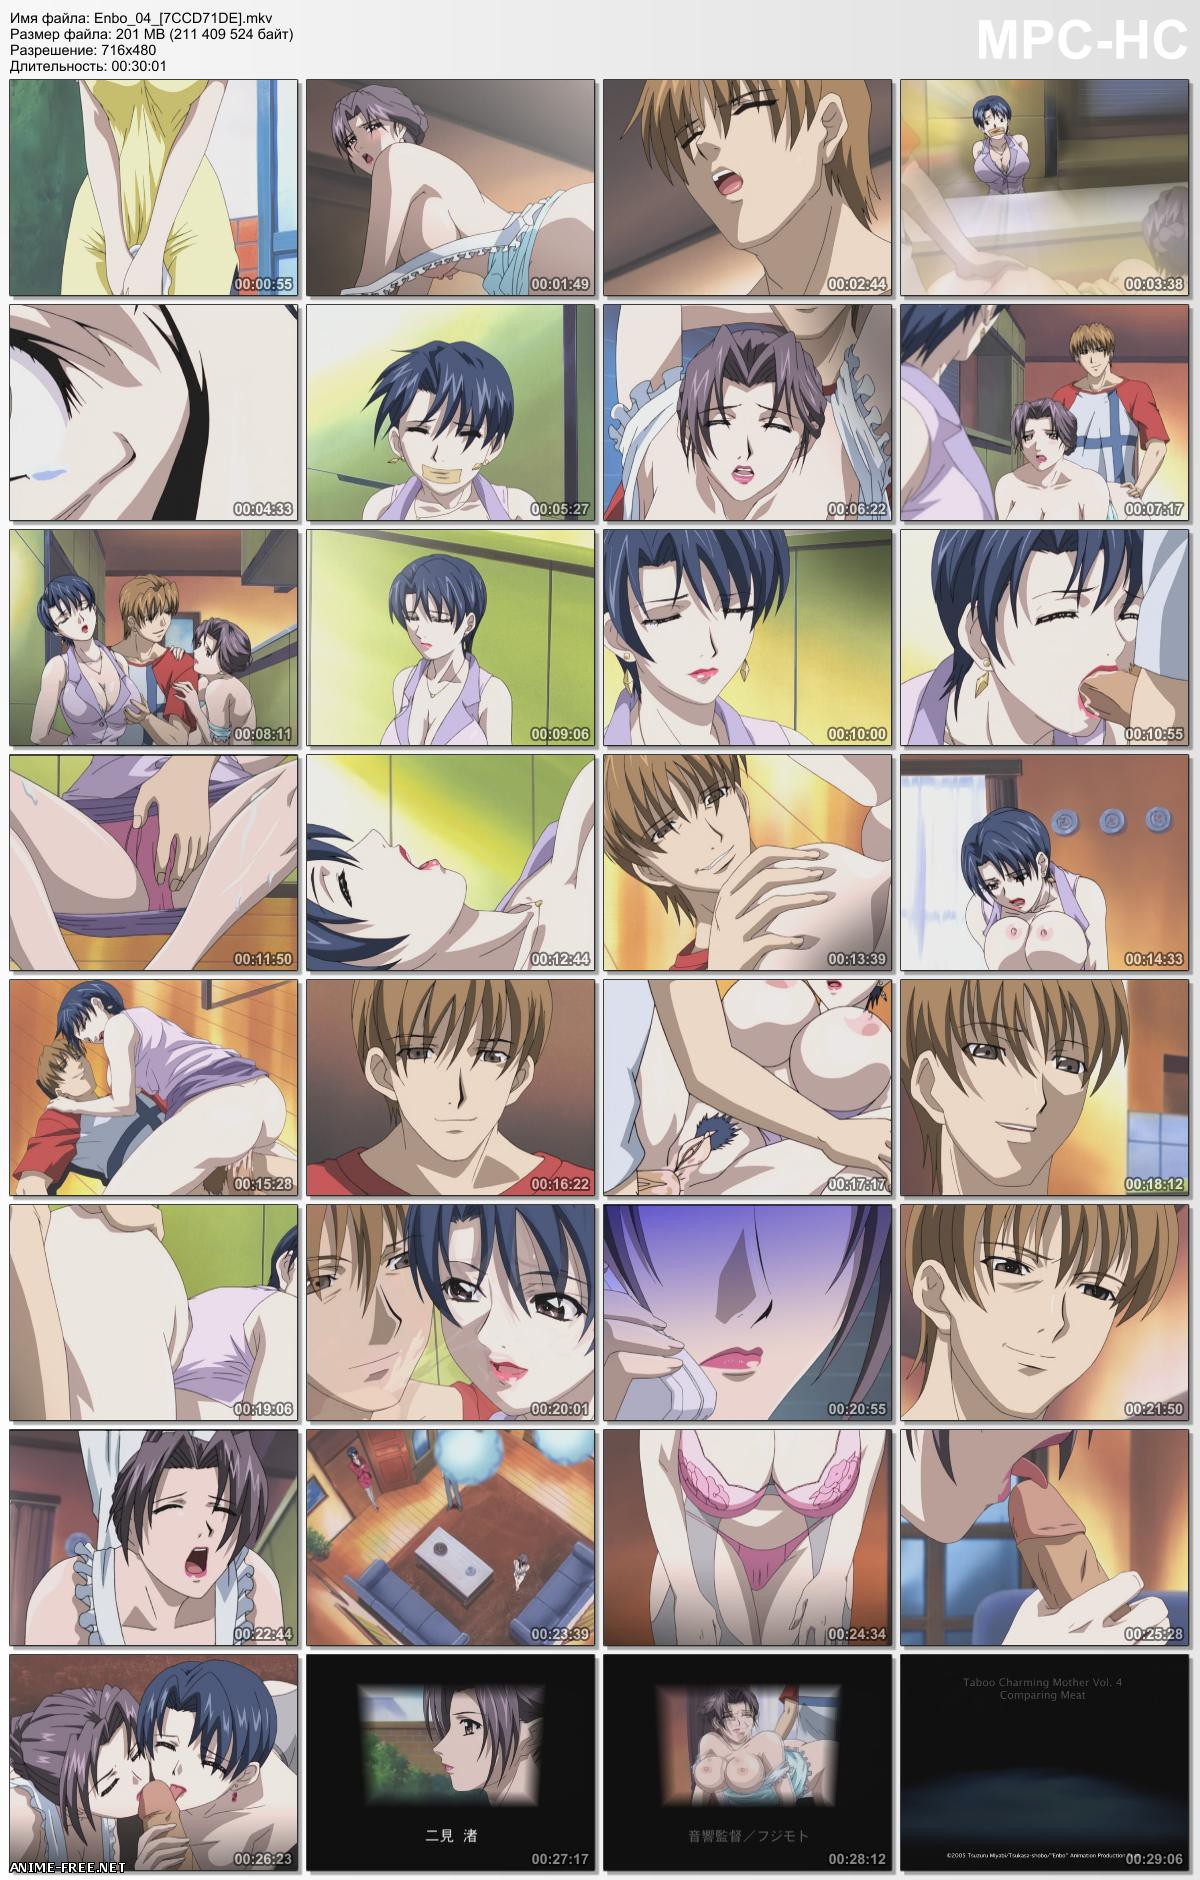 Enbo / Taboo Charming Mother / Запретные прелести матери [6 из 6] [JPN,RUS,ENG] Anime Hentai